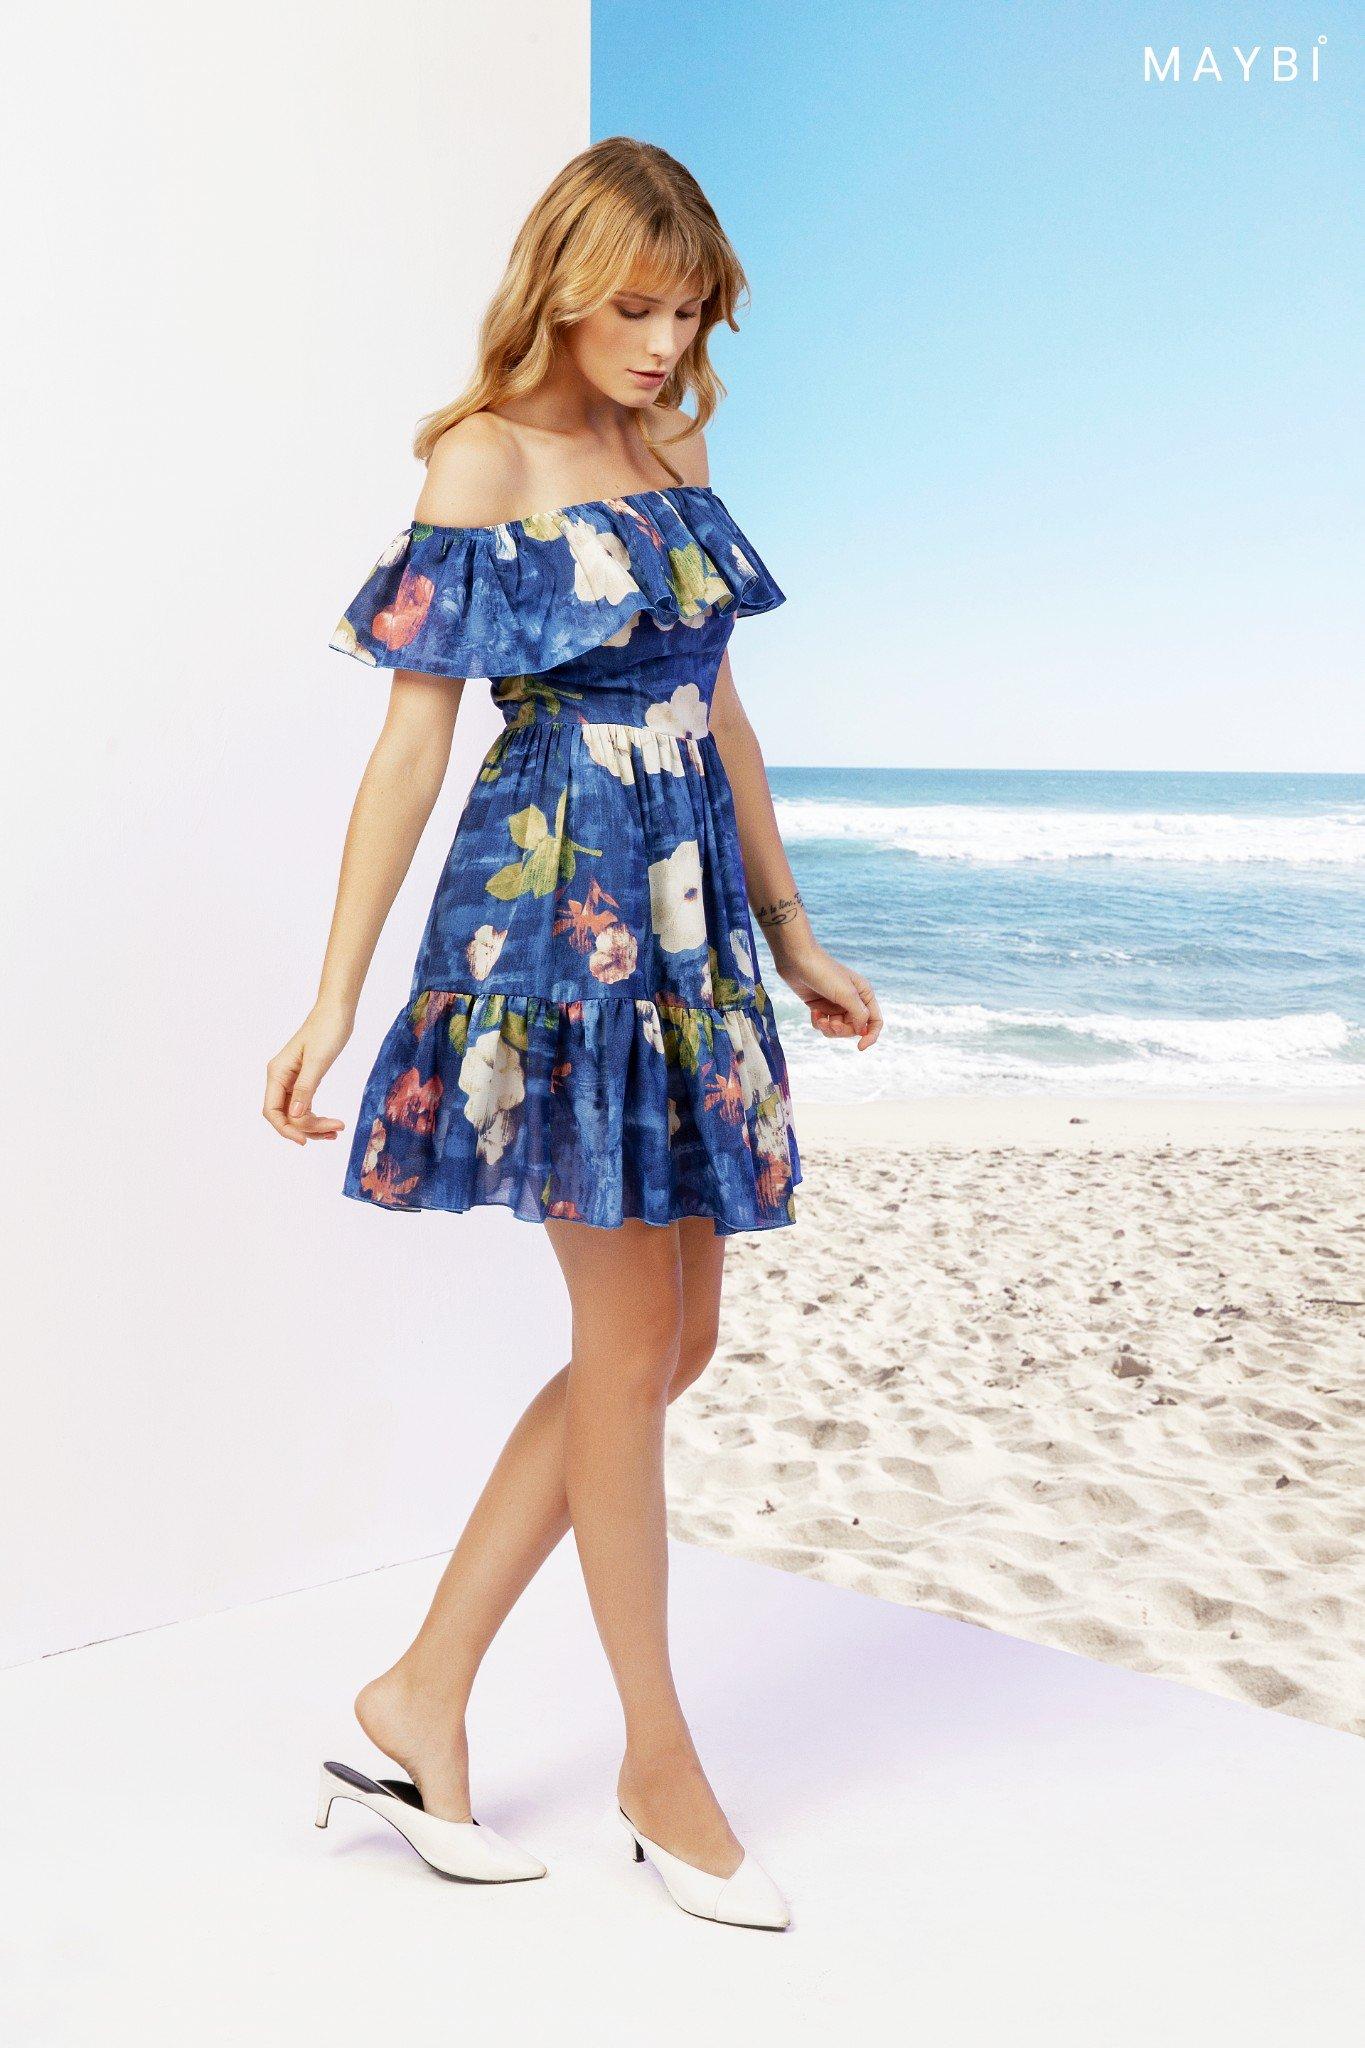 Đầm Trễ Vai Xanh- Periwinkle Dress